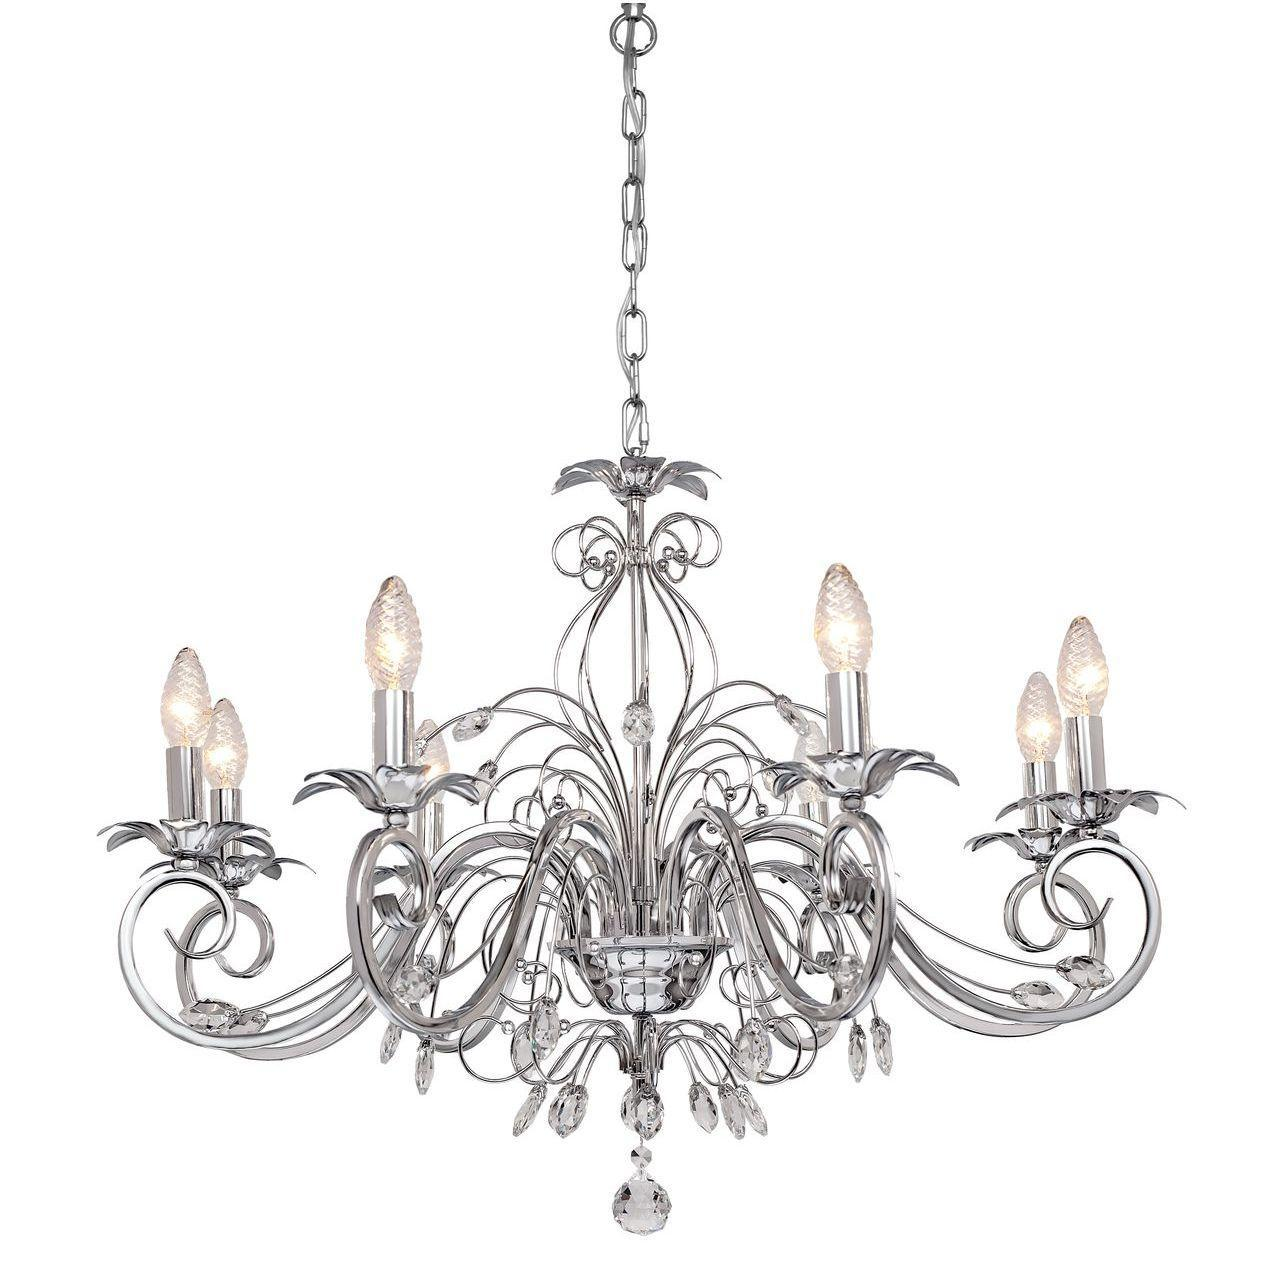 Люстра Silver Light Diana 725.54.8 подвесная silver light diana 508 43 1